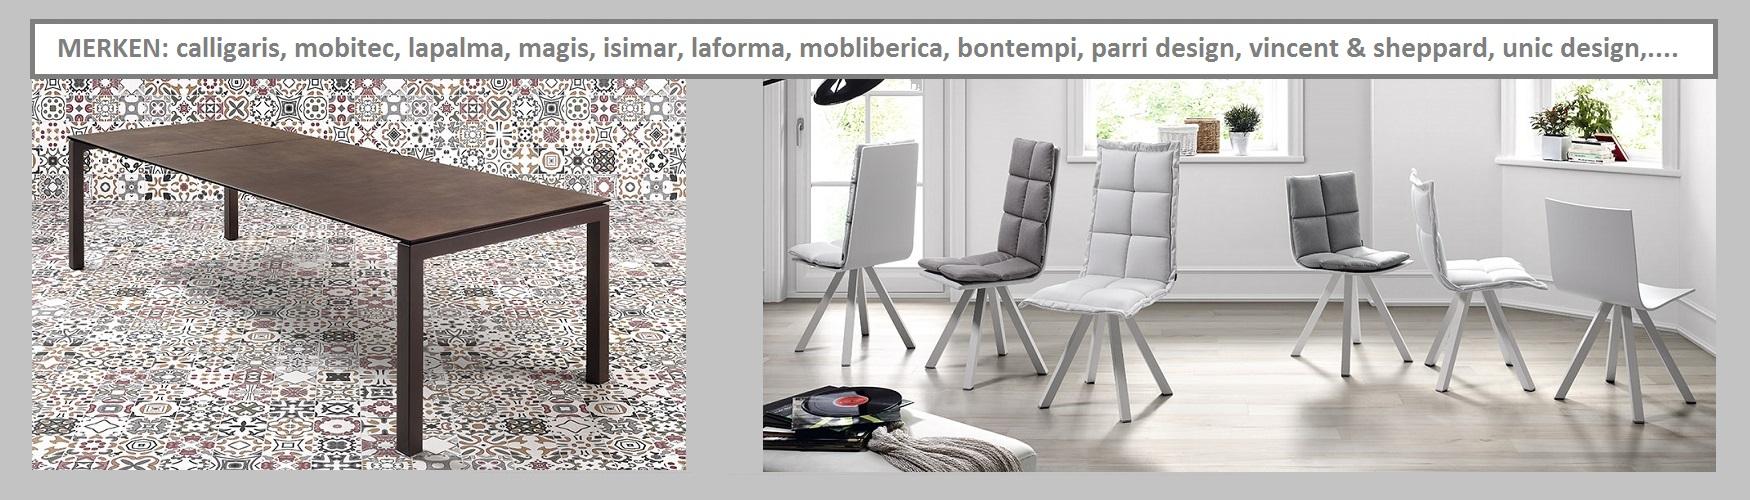 keramische-tafel-julia-mobliberica-slide